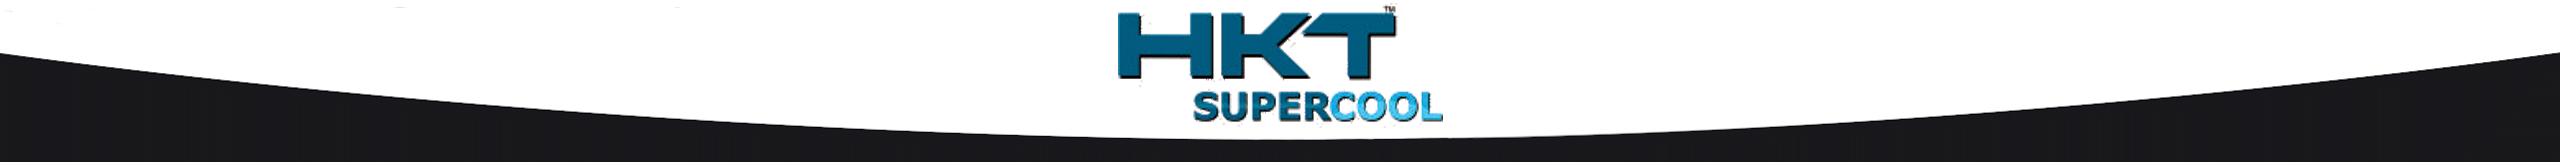 HKT Super Cool